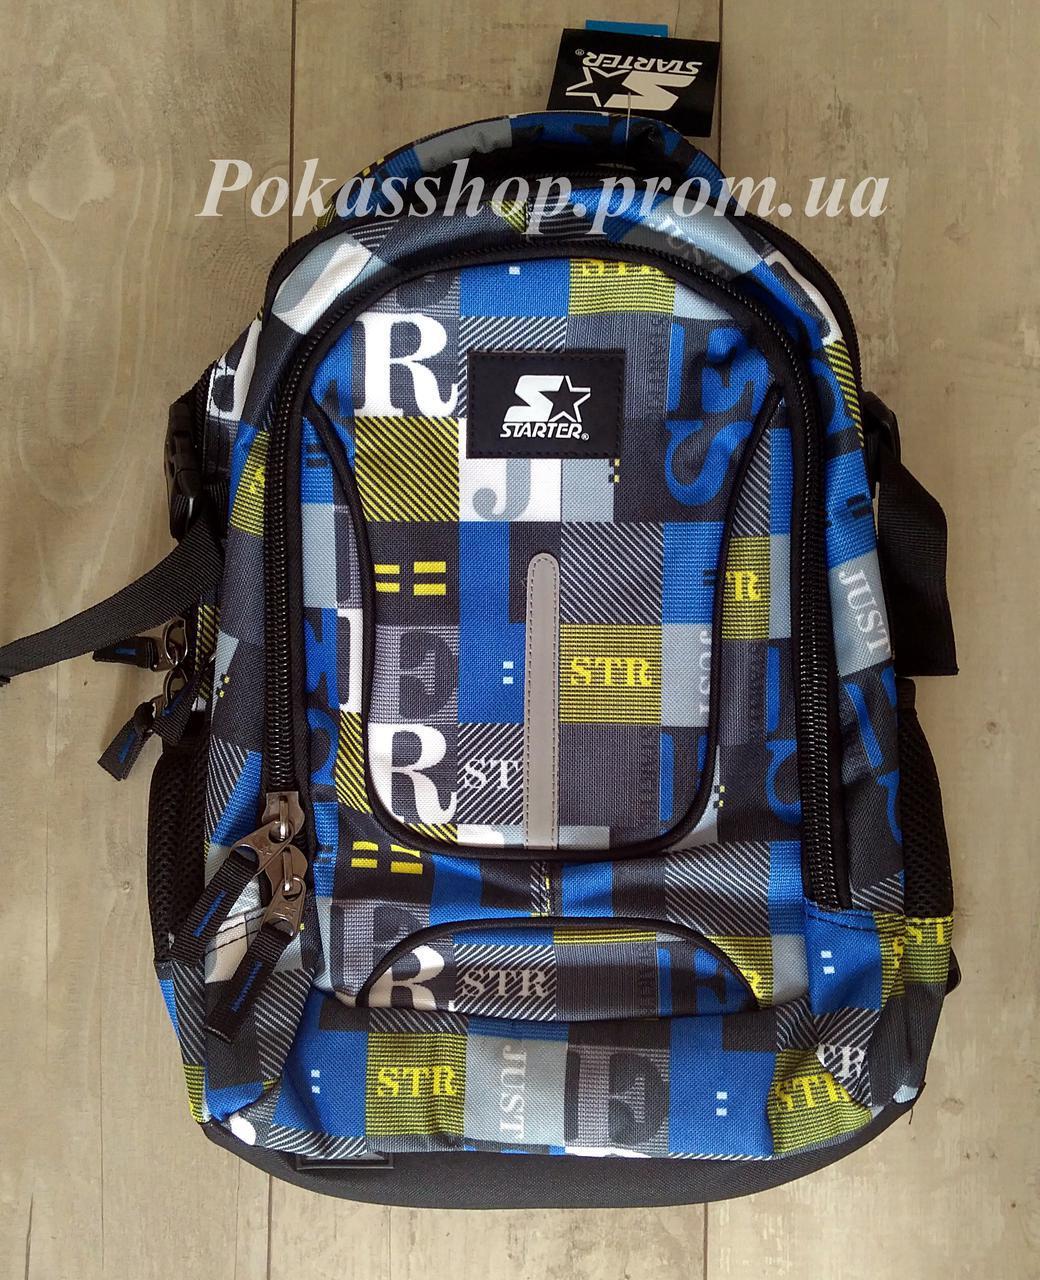 4aab3142d0fc Рюкзак Starter. Желтый, цена 870 грн., купить в Киеве — Prom.ua  (ID#745151353)